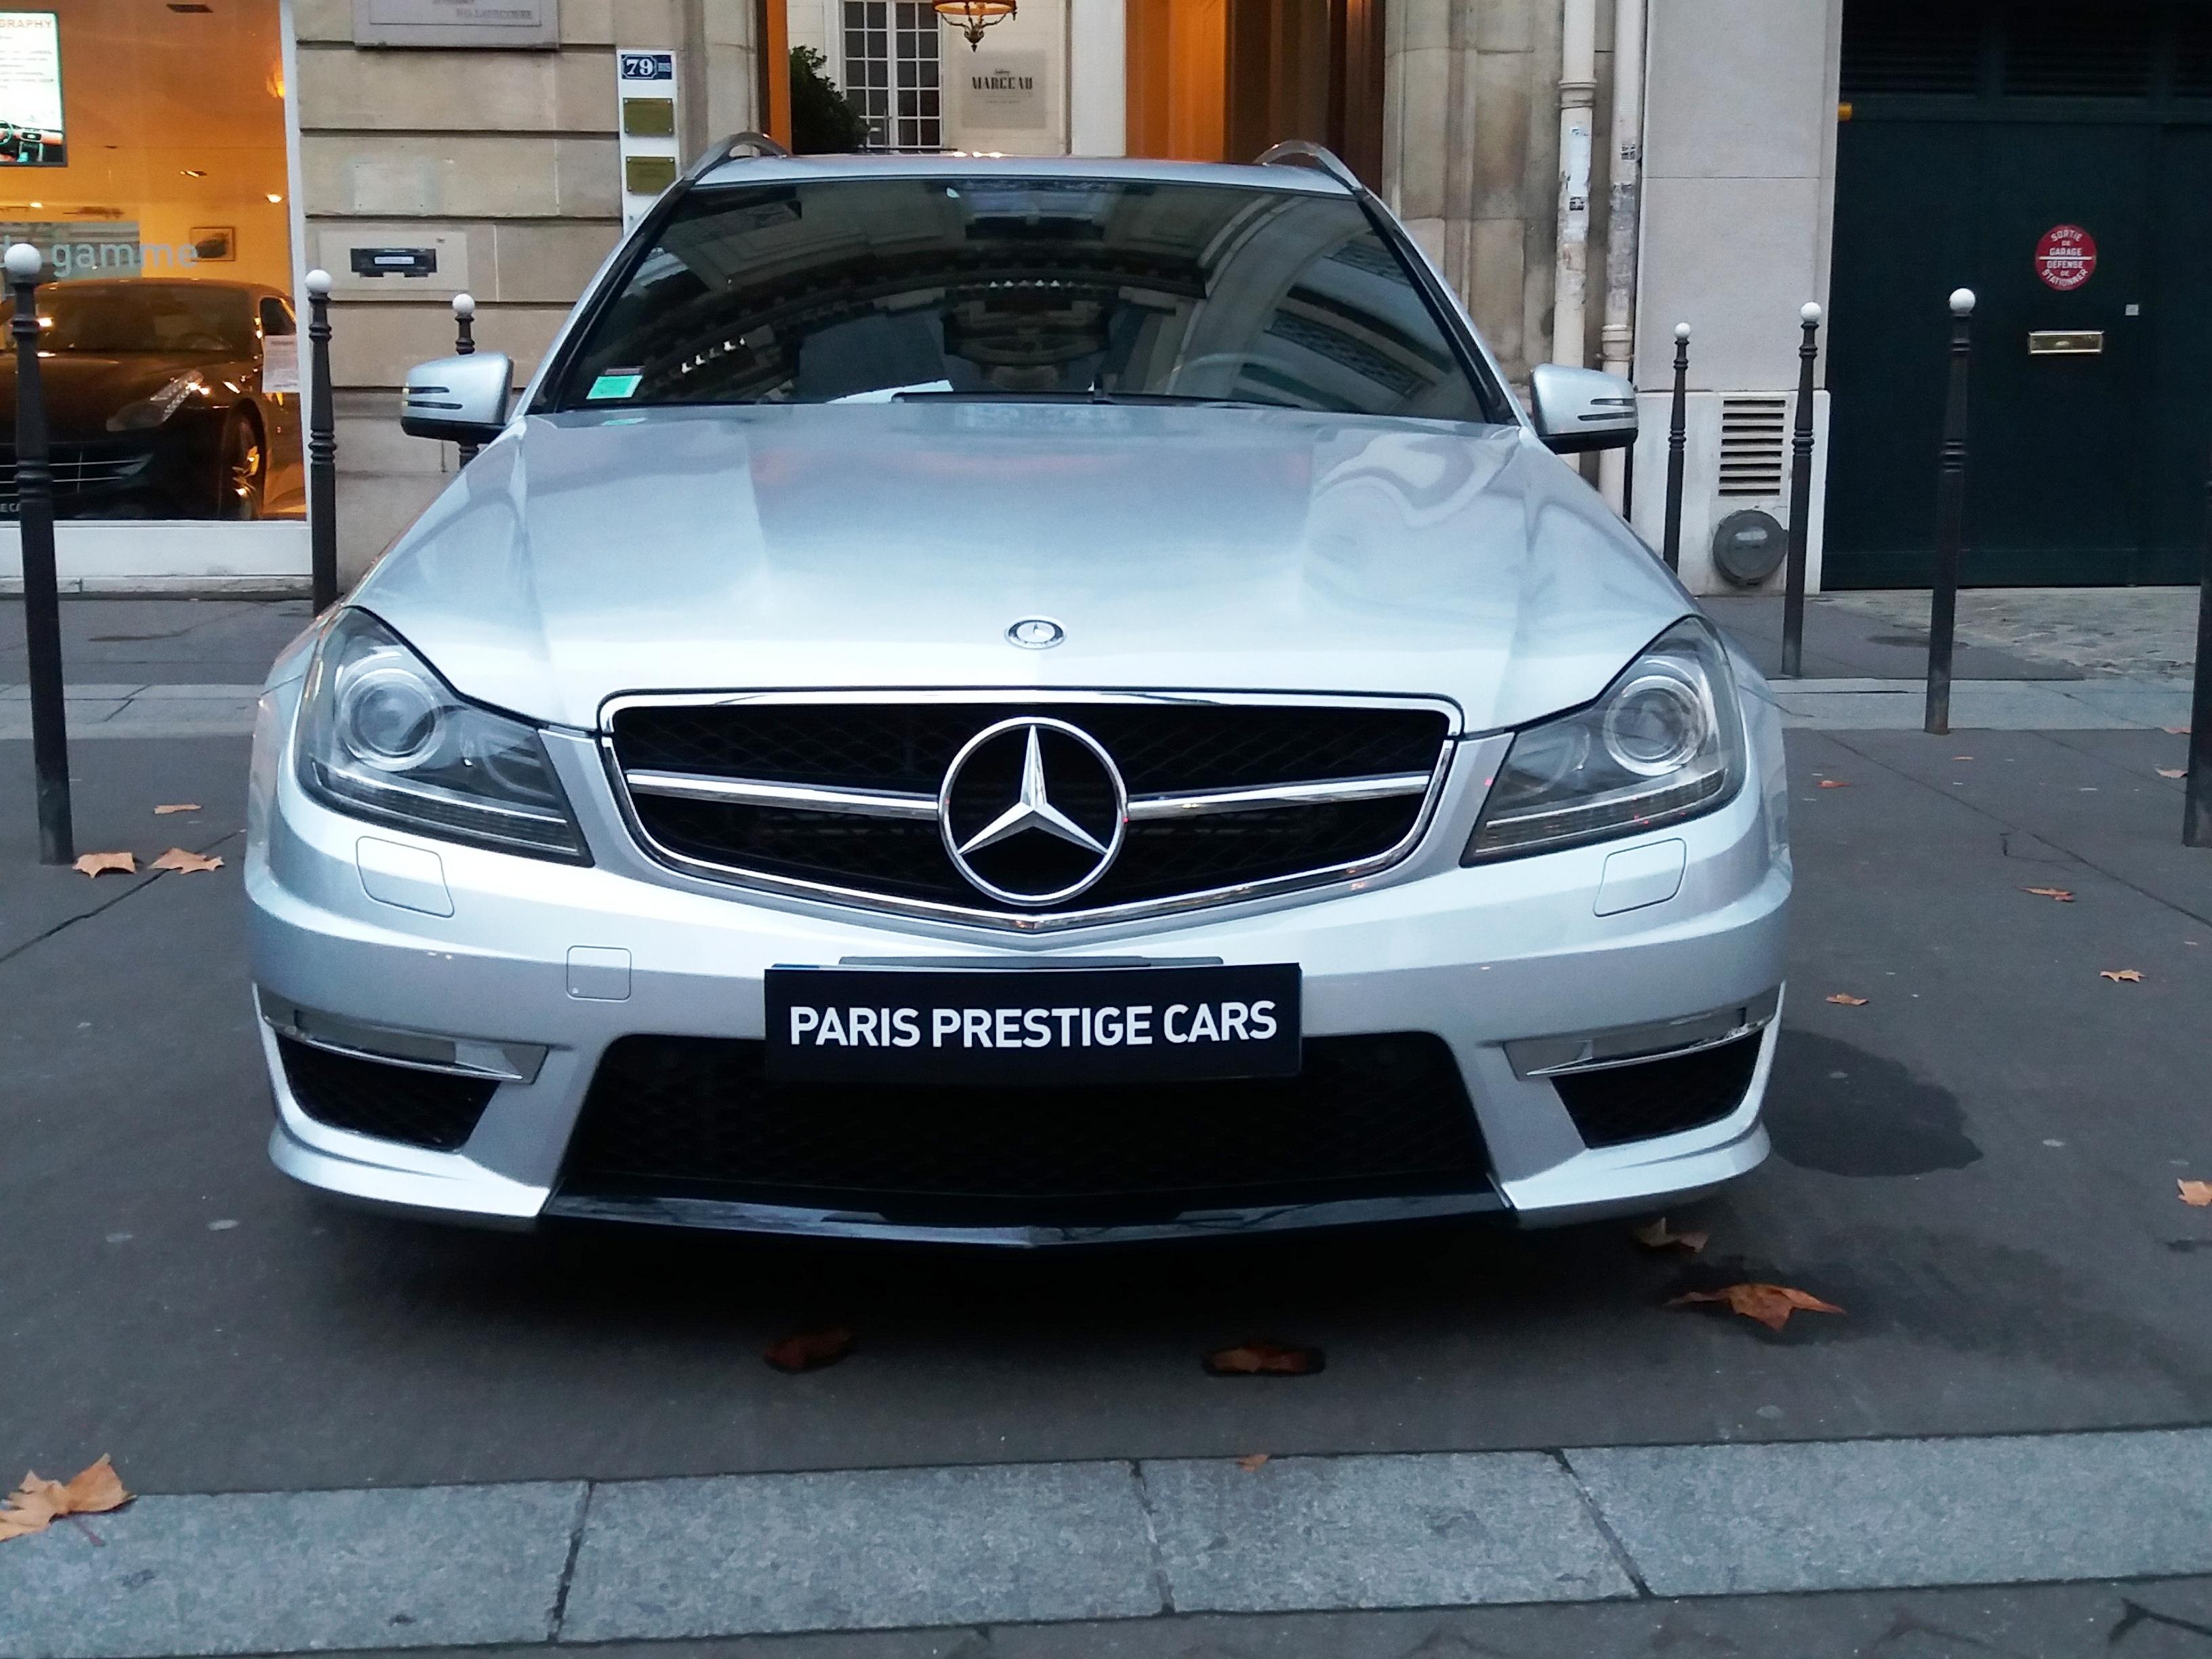 paris prestige cars occasions ferrari aston martin porsche lamborghini mercedes bentley. Black Bedroom Furniture Sets. Home Design Ideas